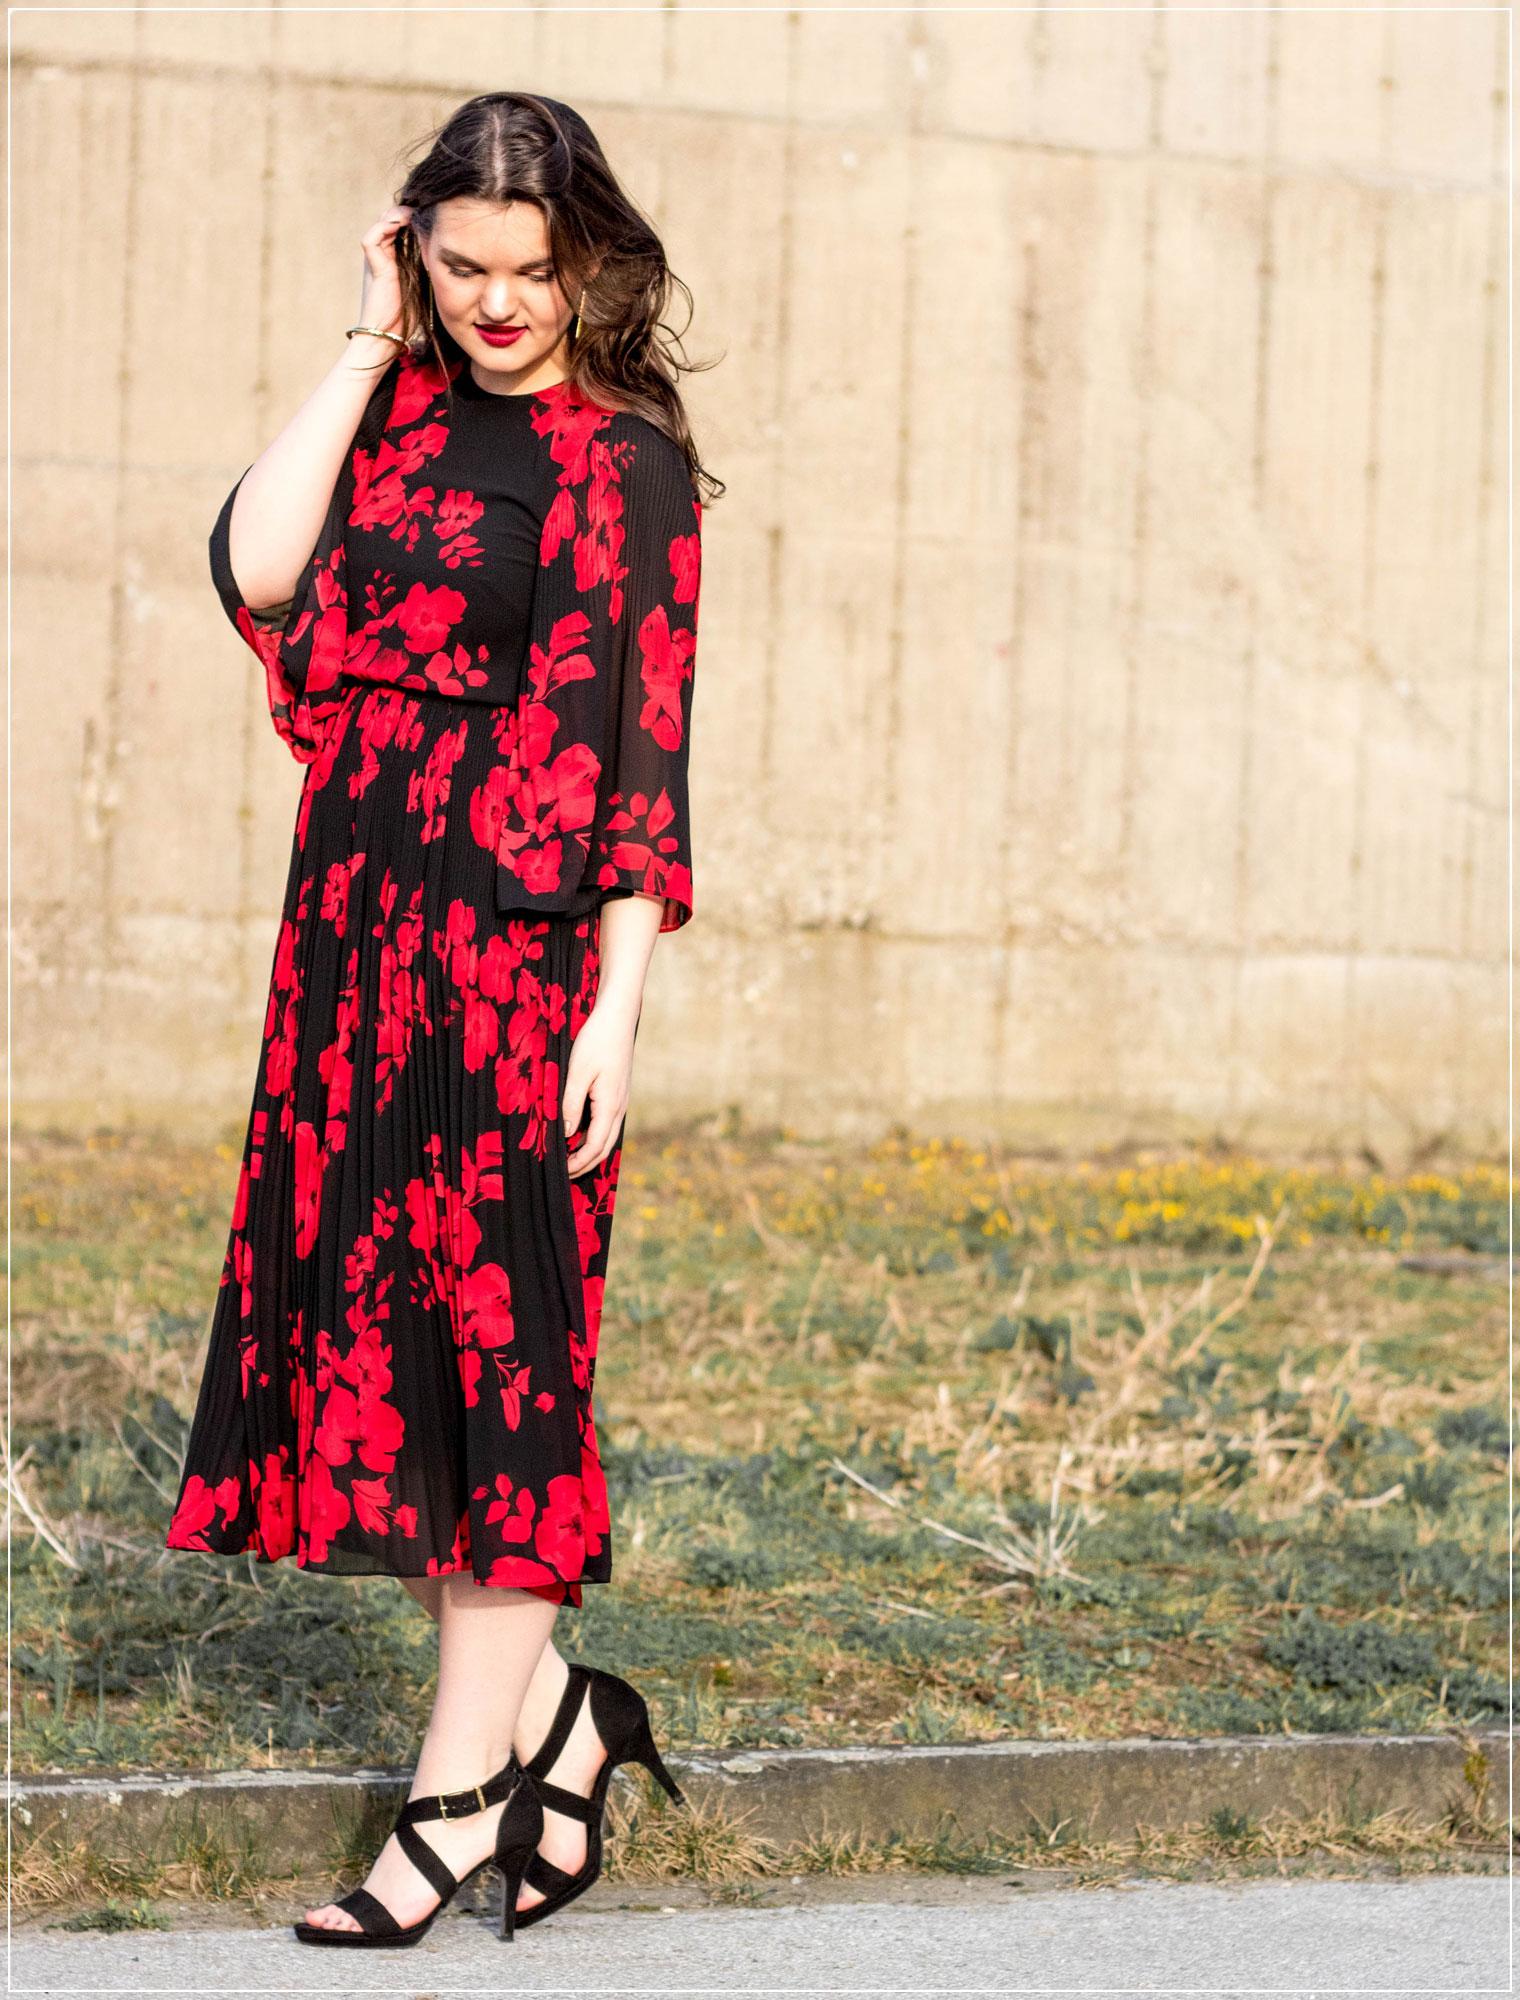 Golden Hour, Wedding Style, Goldene Stunde, Blogger Tipps, Sommerkleid, Sommeroutfit, Outfitinspiration, Summerstyle, Boho, Modebloggerin, Fashionbloggerin, Modeblog, Ruhrgebiet